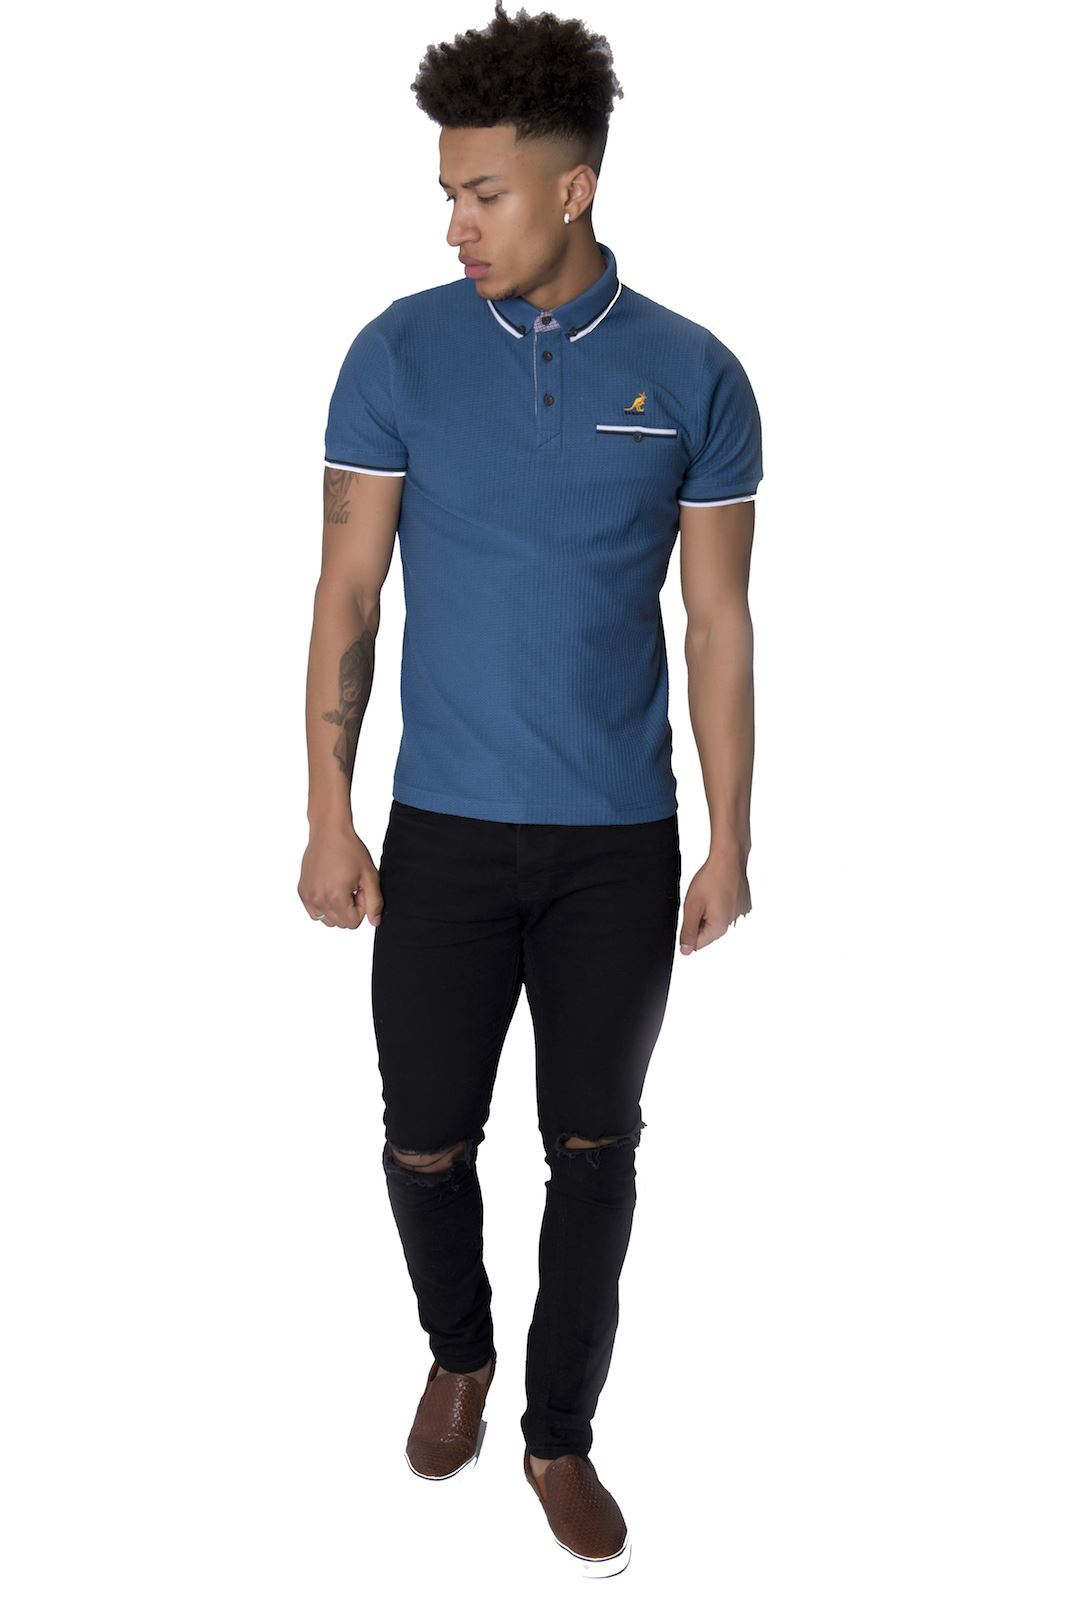 Kangol mens short sleeve button down collared cotton polo for Best short sleeve button down shirts reddit